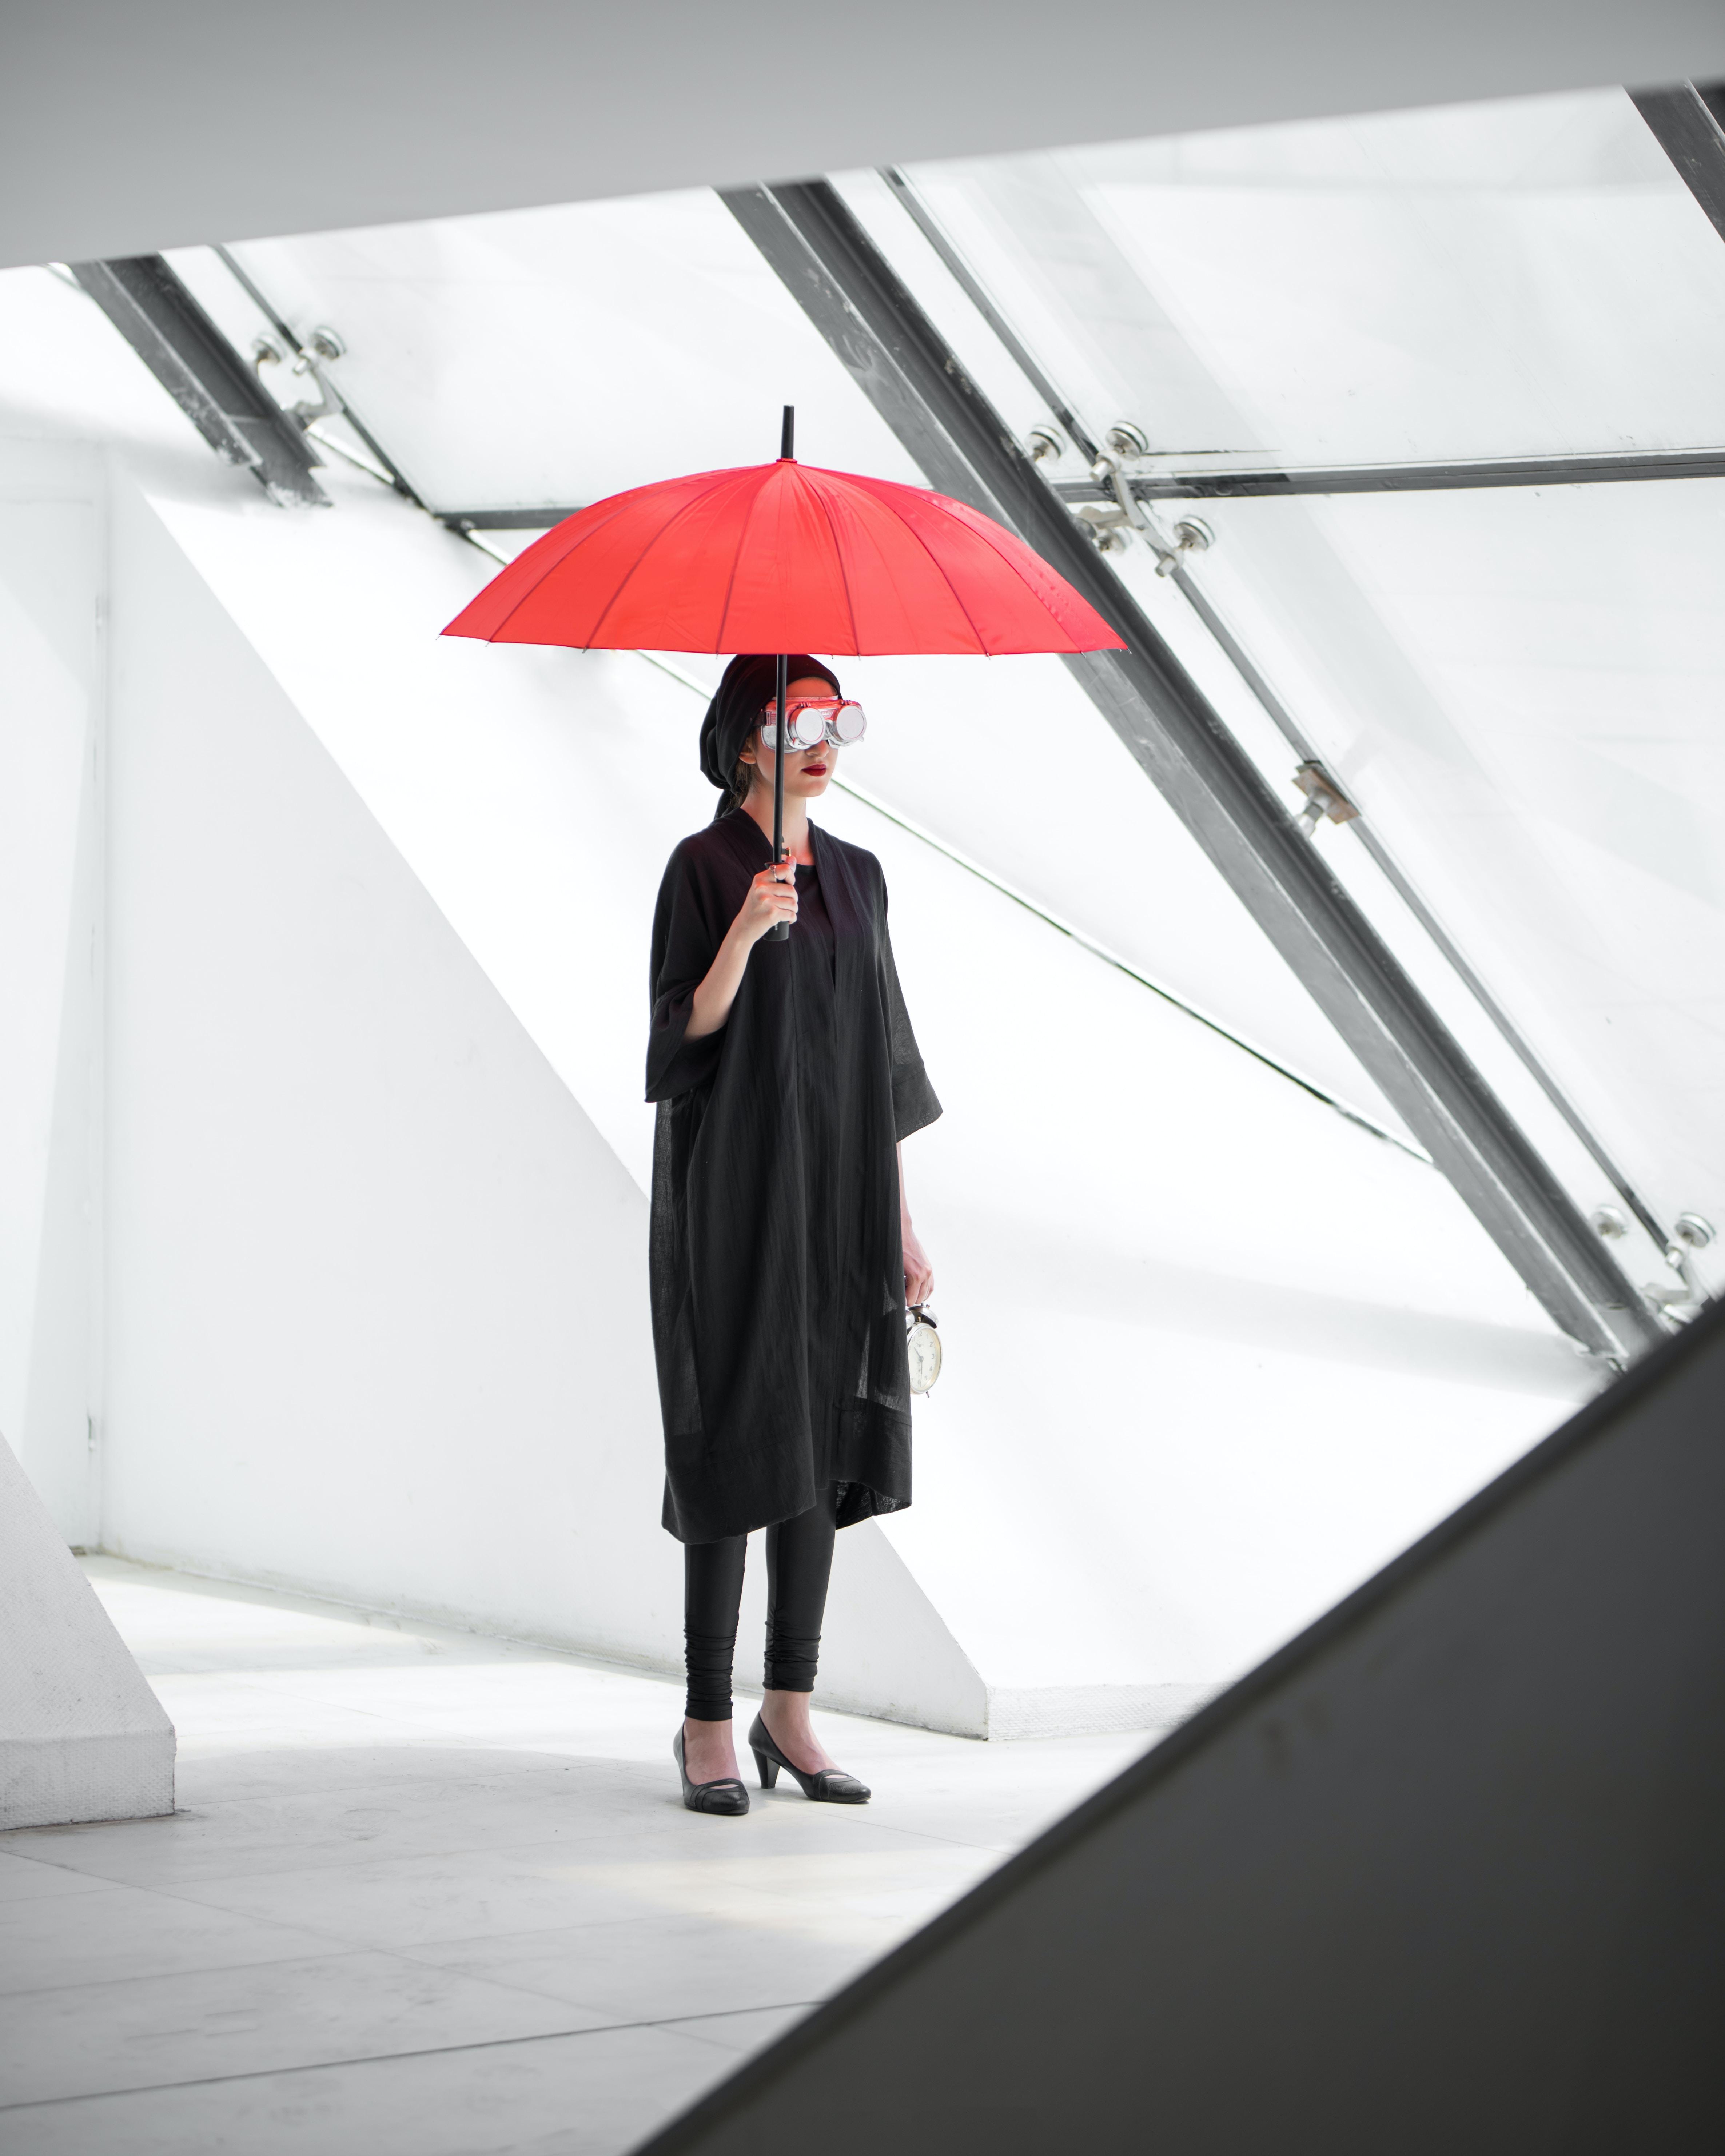 woman standing holding umbrella inside building